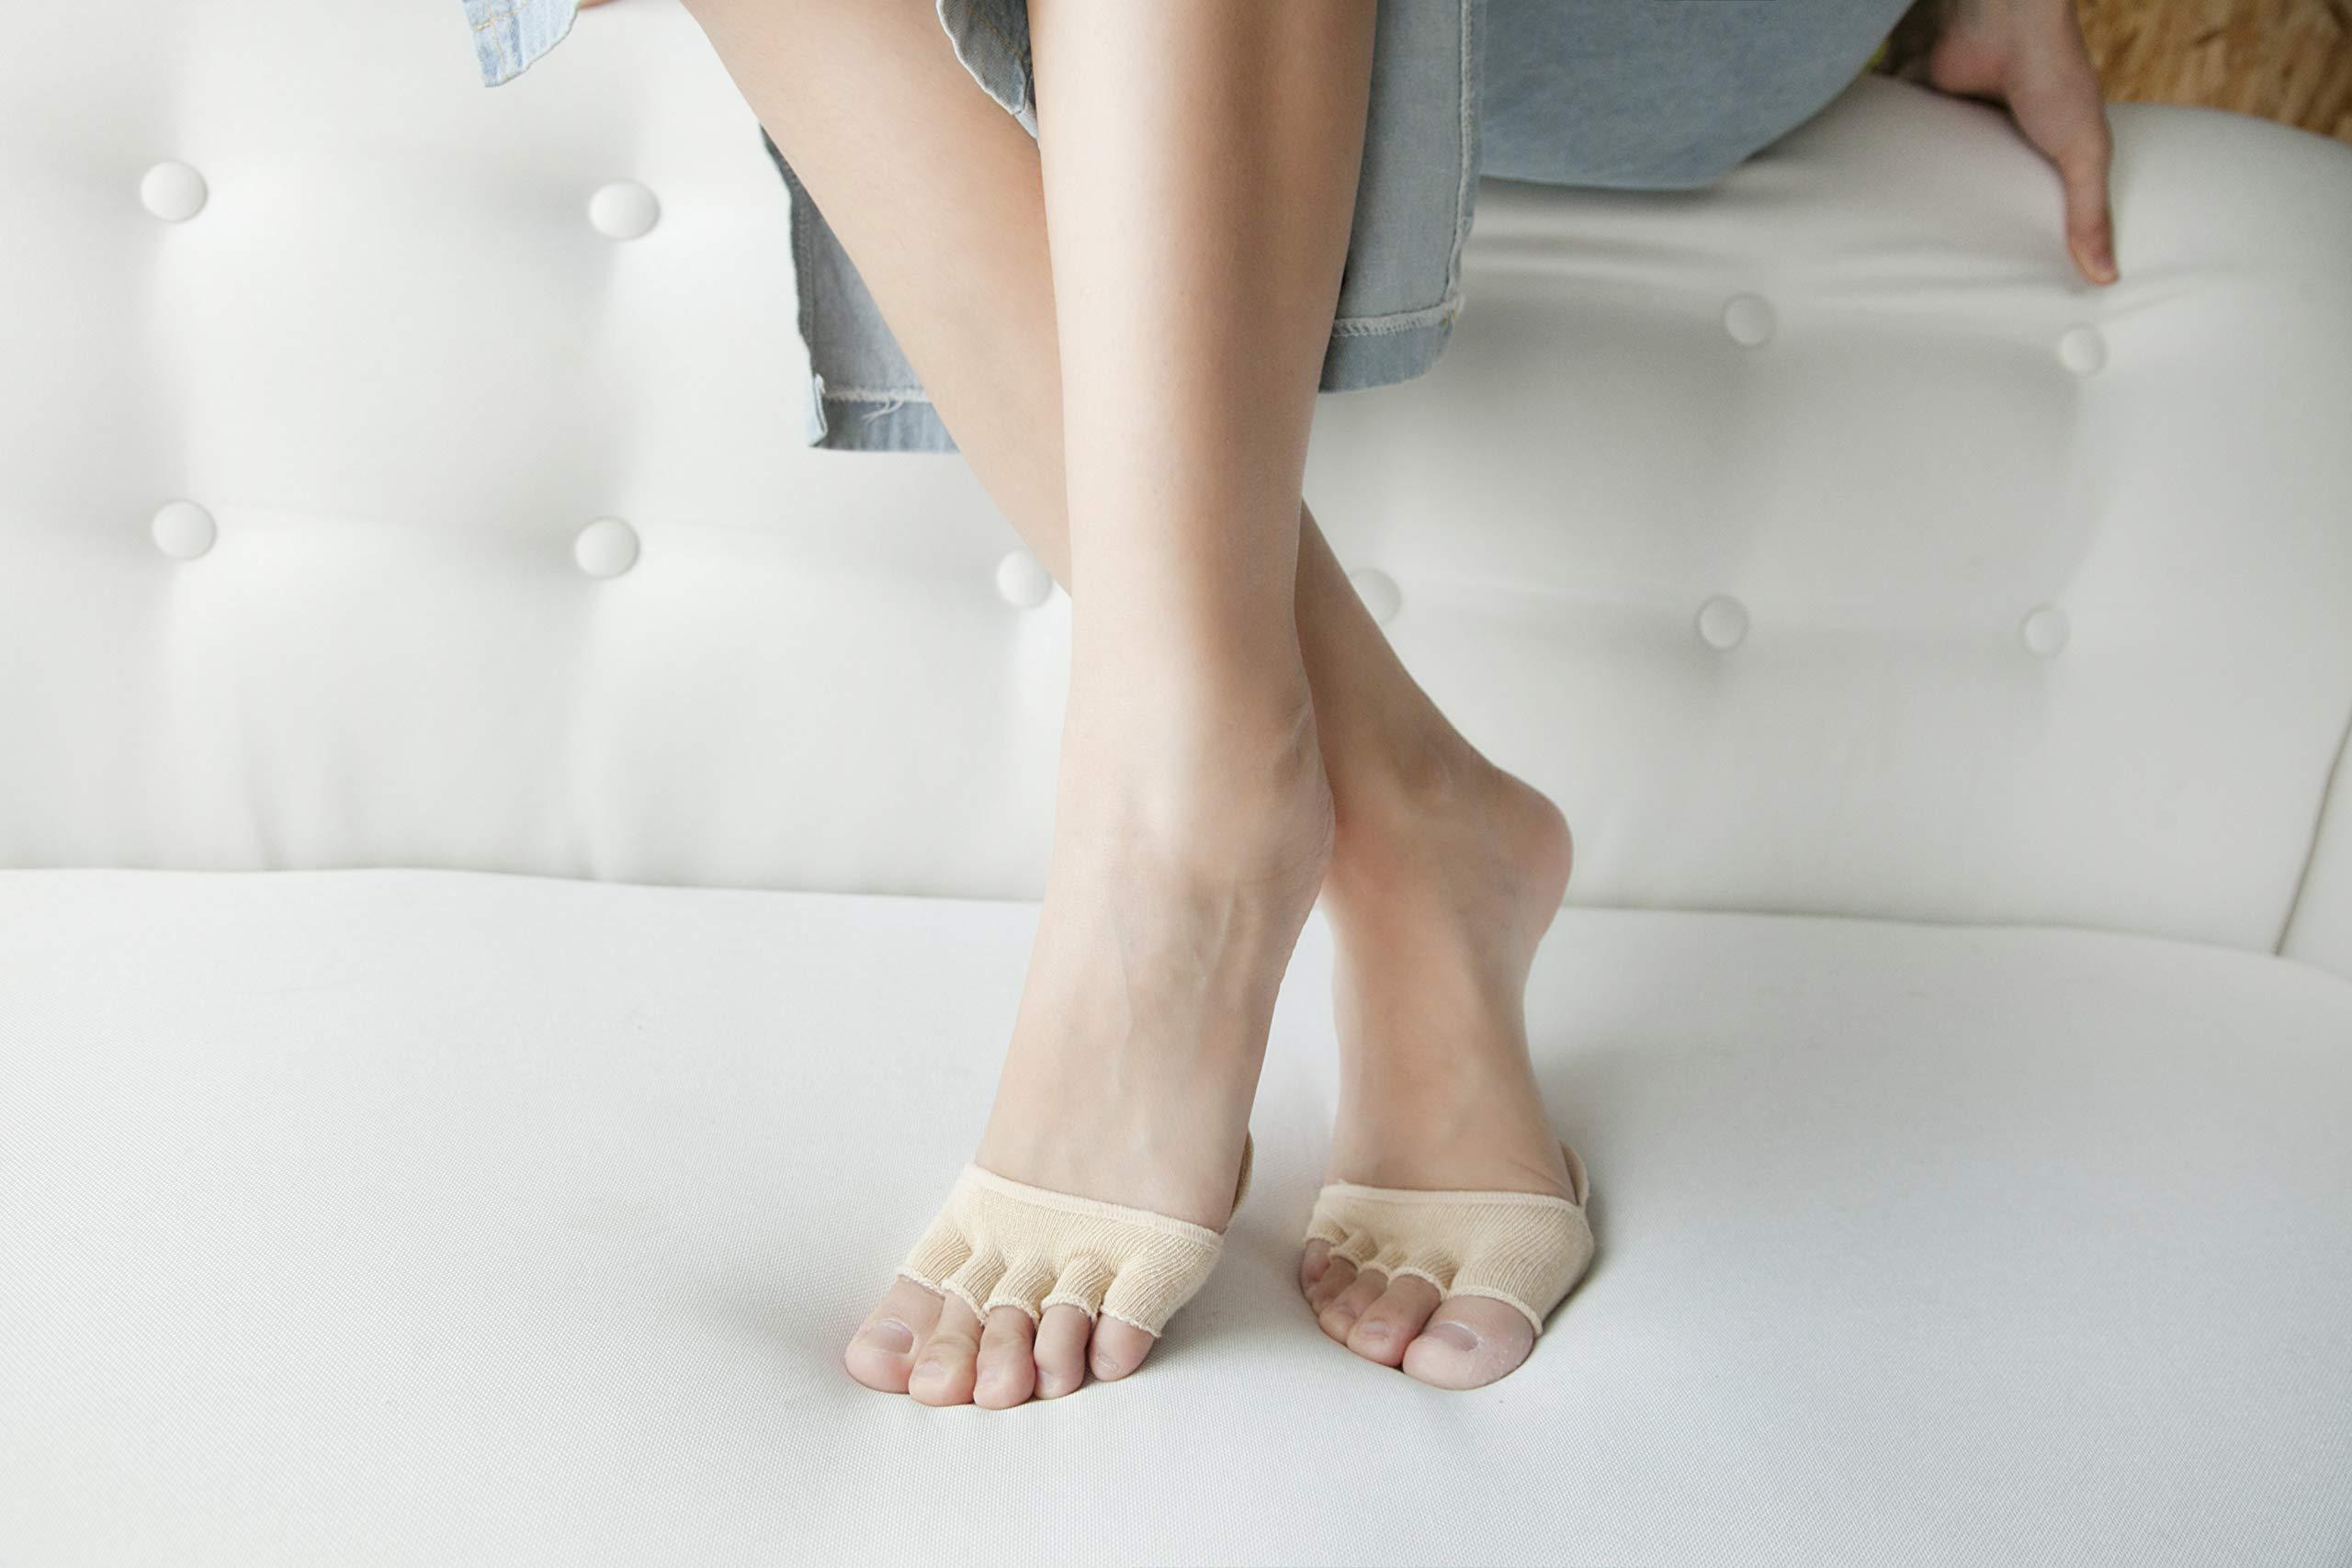 Toe Socks, Cotton Non-Slip Women's Toe Toppers Socks Toe Separating Socks No-Show Half Socks Barre Pilates Yoga Half Palm Socks(2 Pairs) by Pnrskter (Image #7)